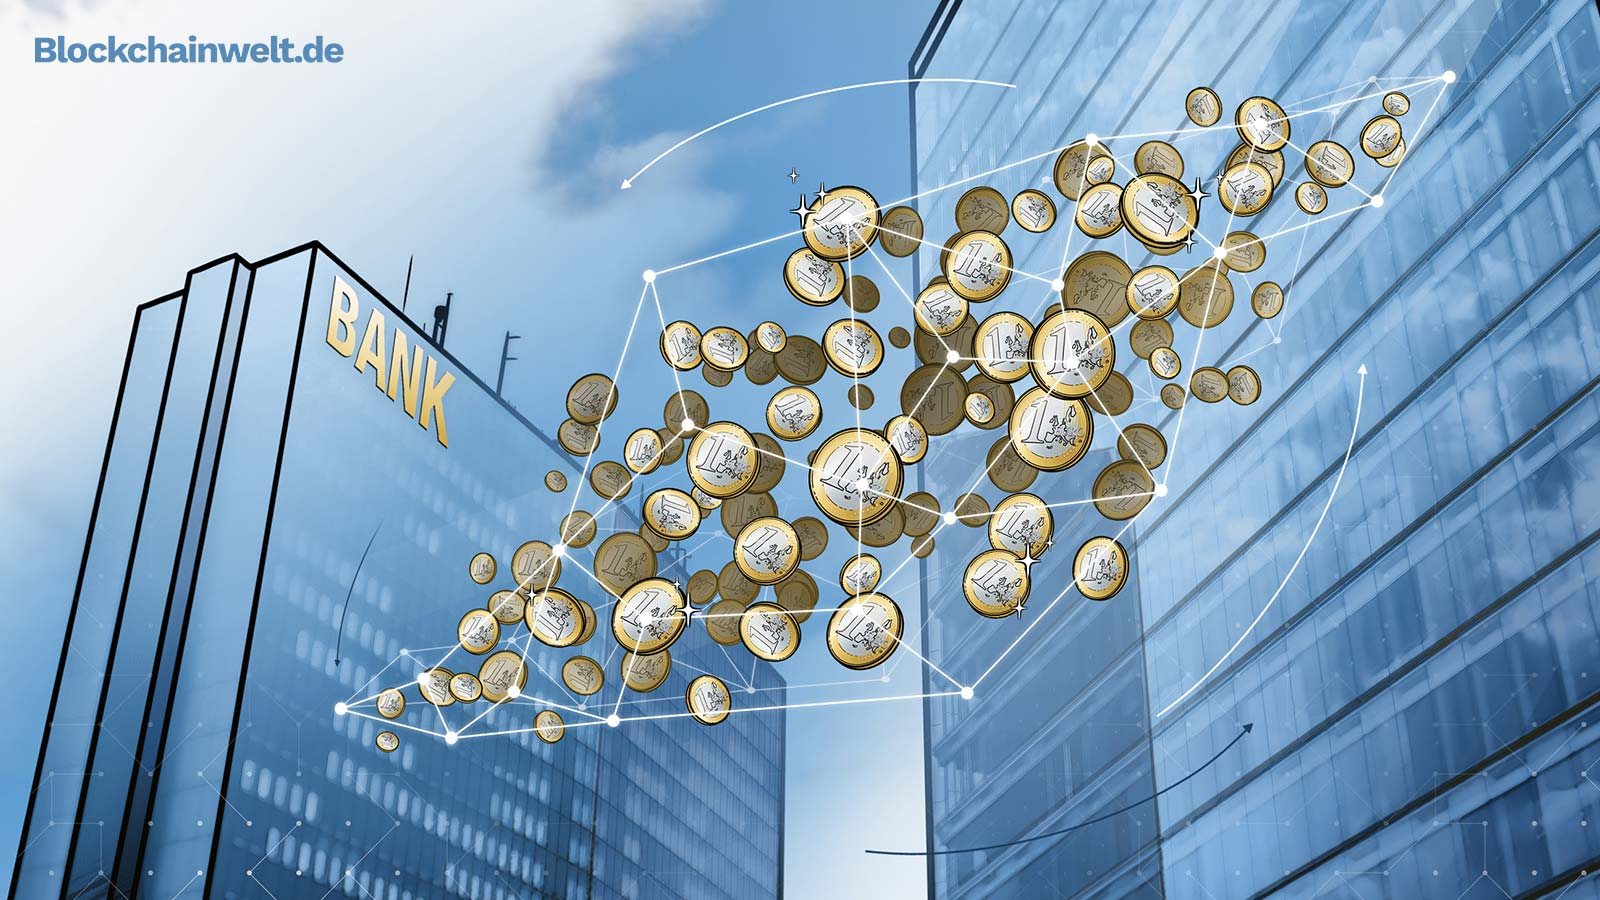 Central Bank Digital Currencies (CBDC) Illustration